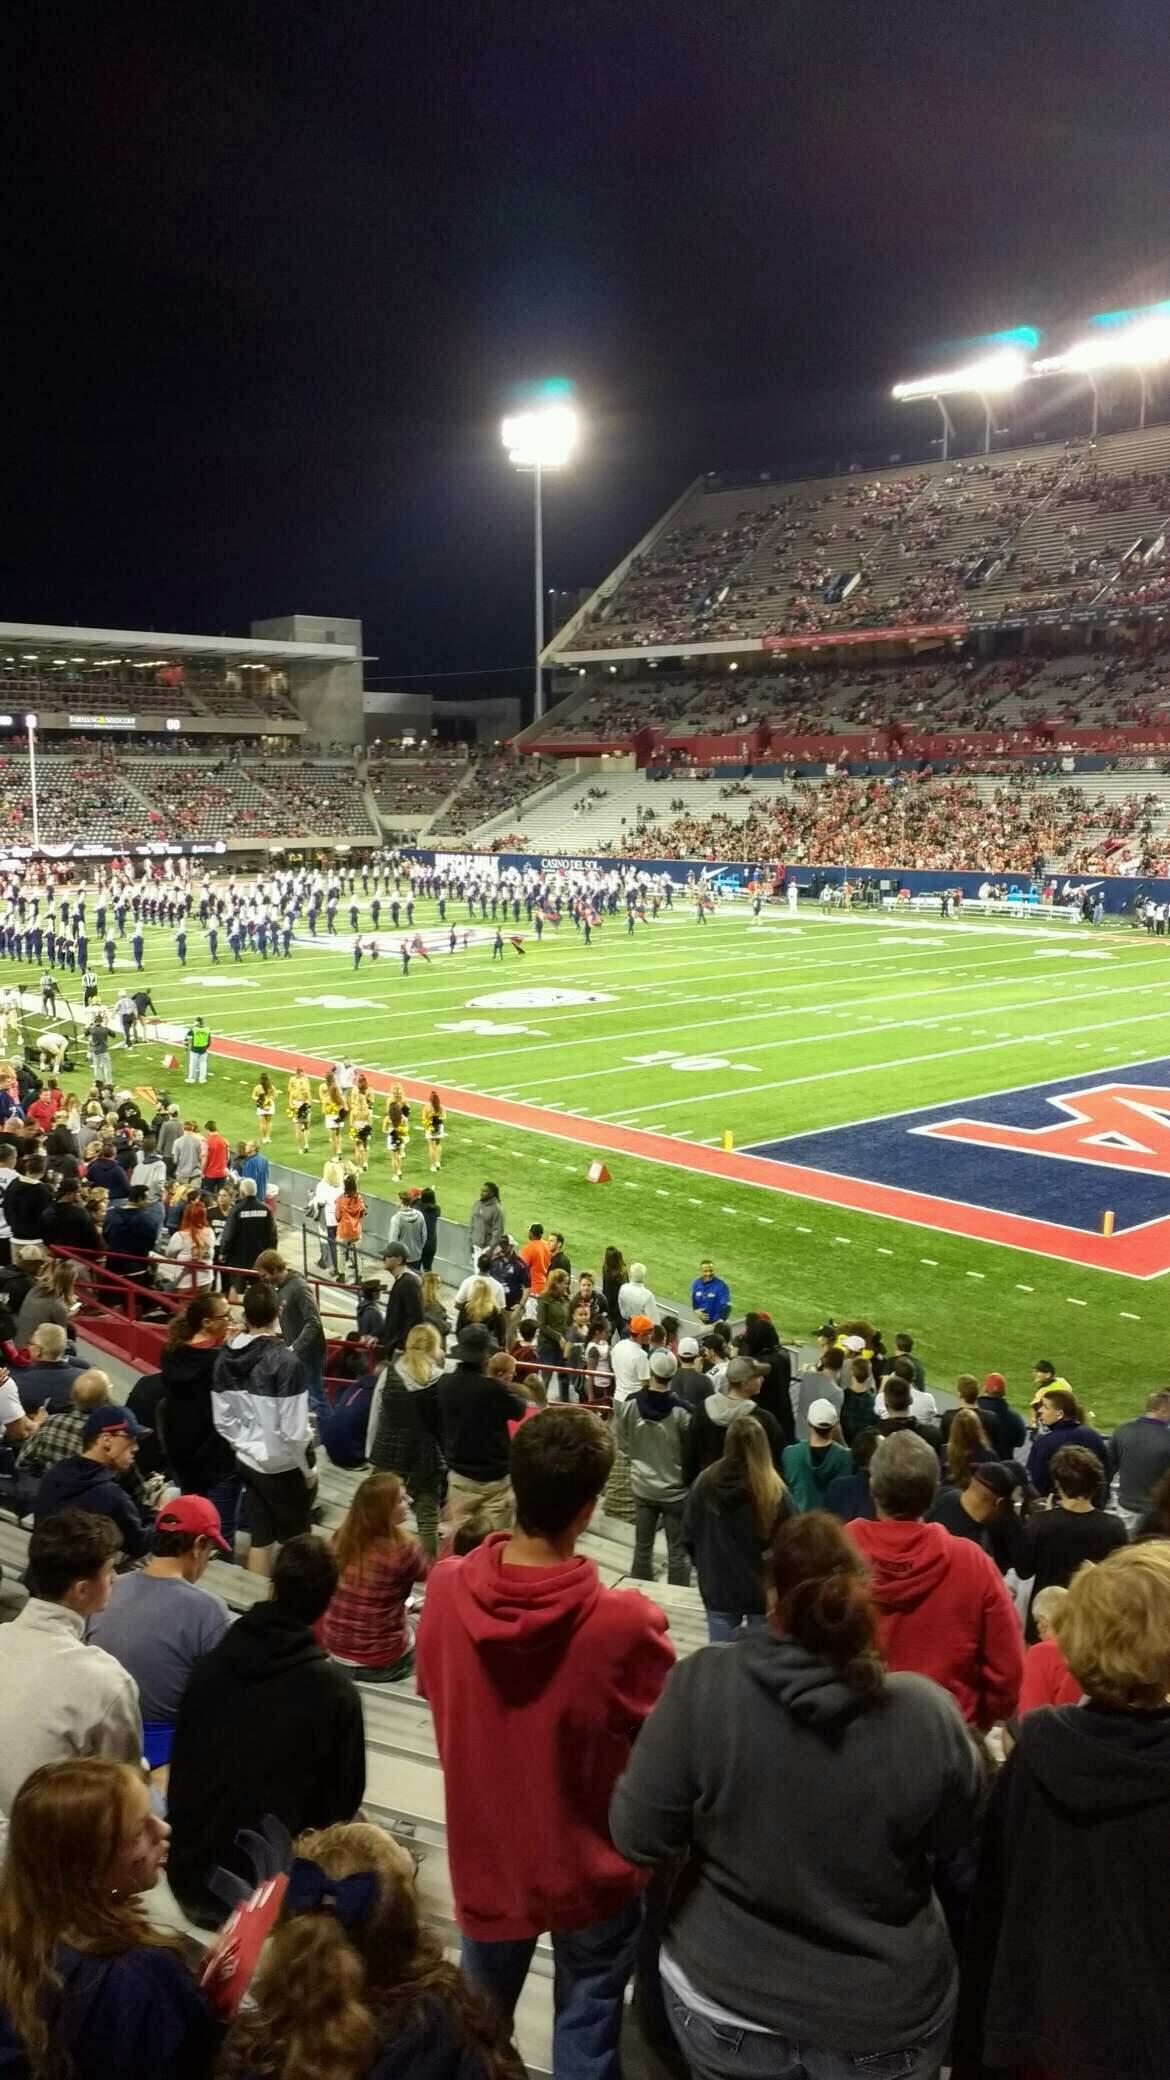 Arizona Stadium Section 16 Row 25 Seat 5